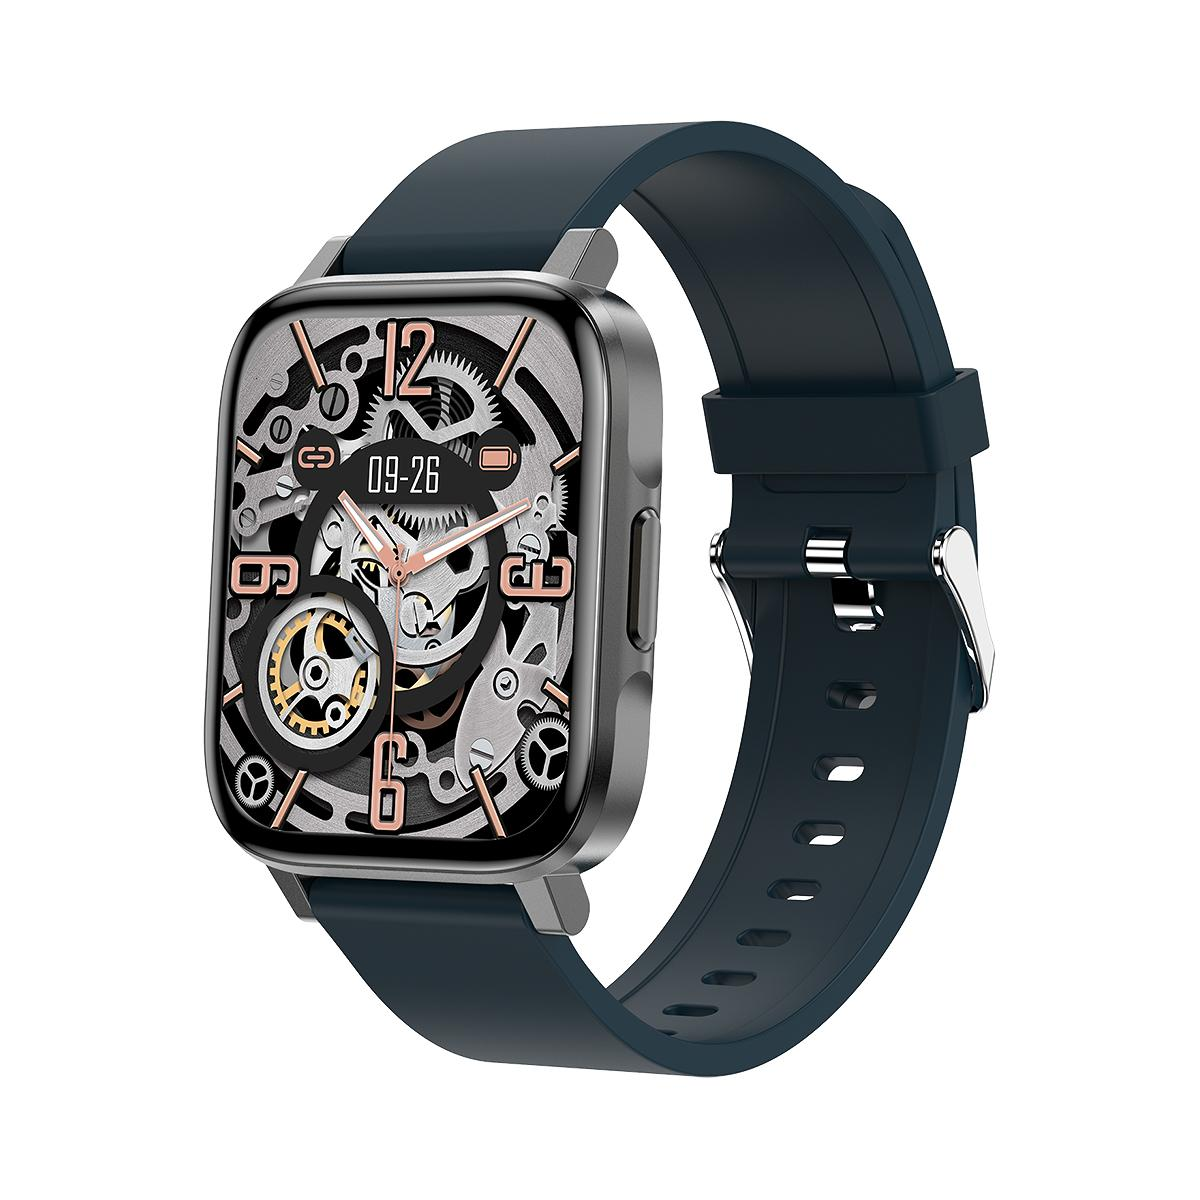 G51 local music palyer digital smart watch 3